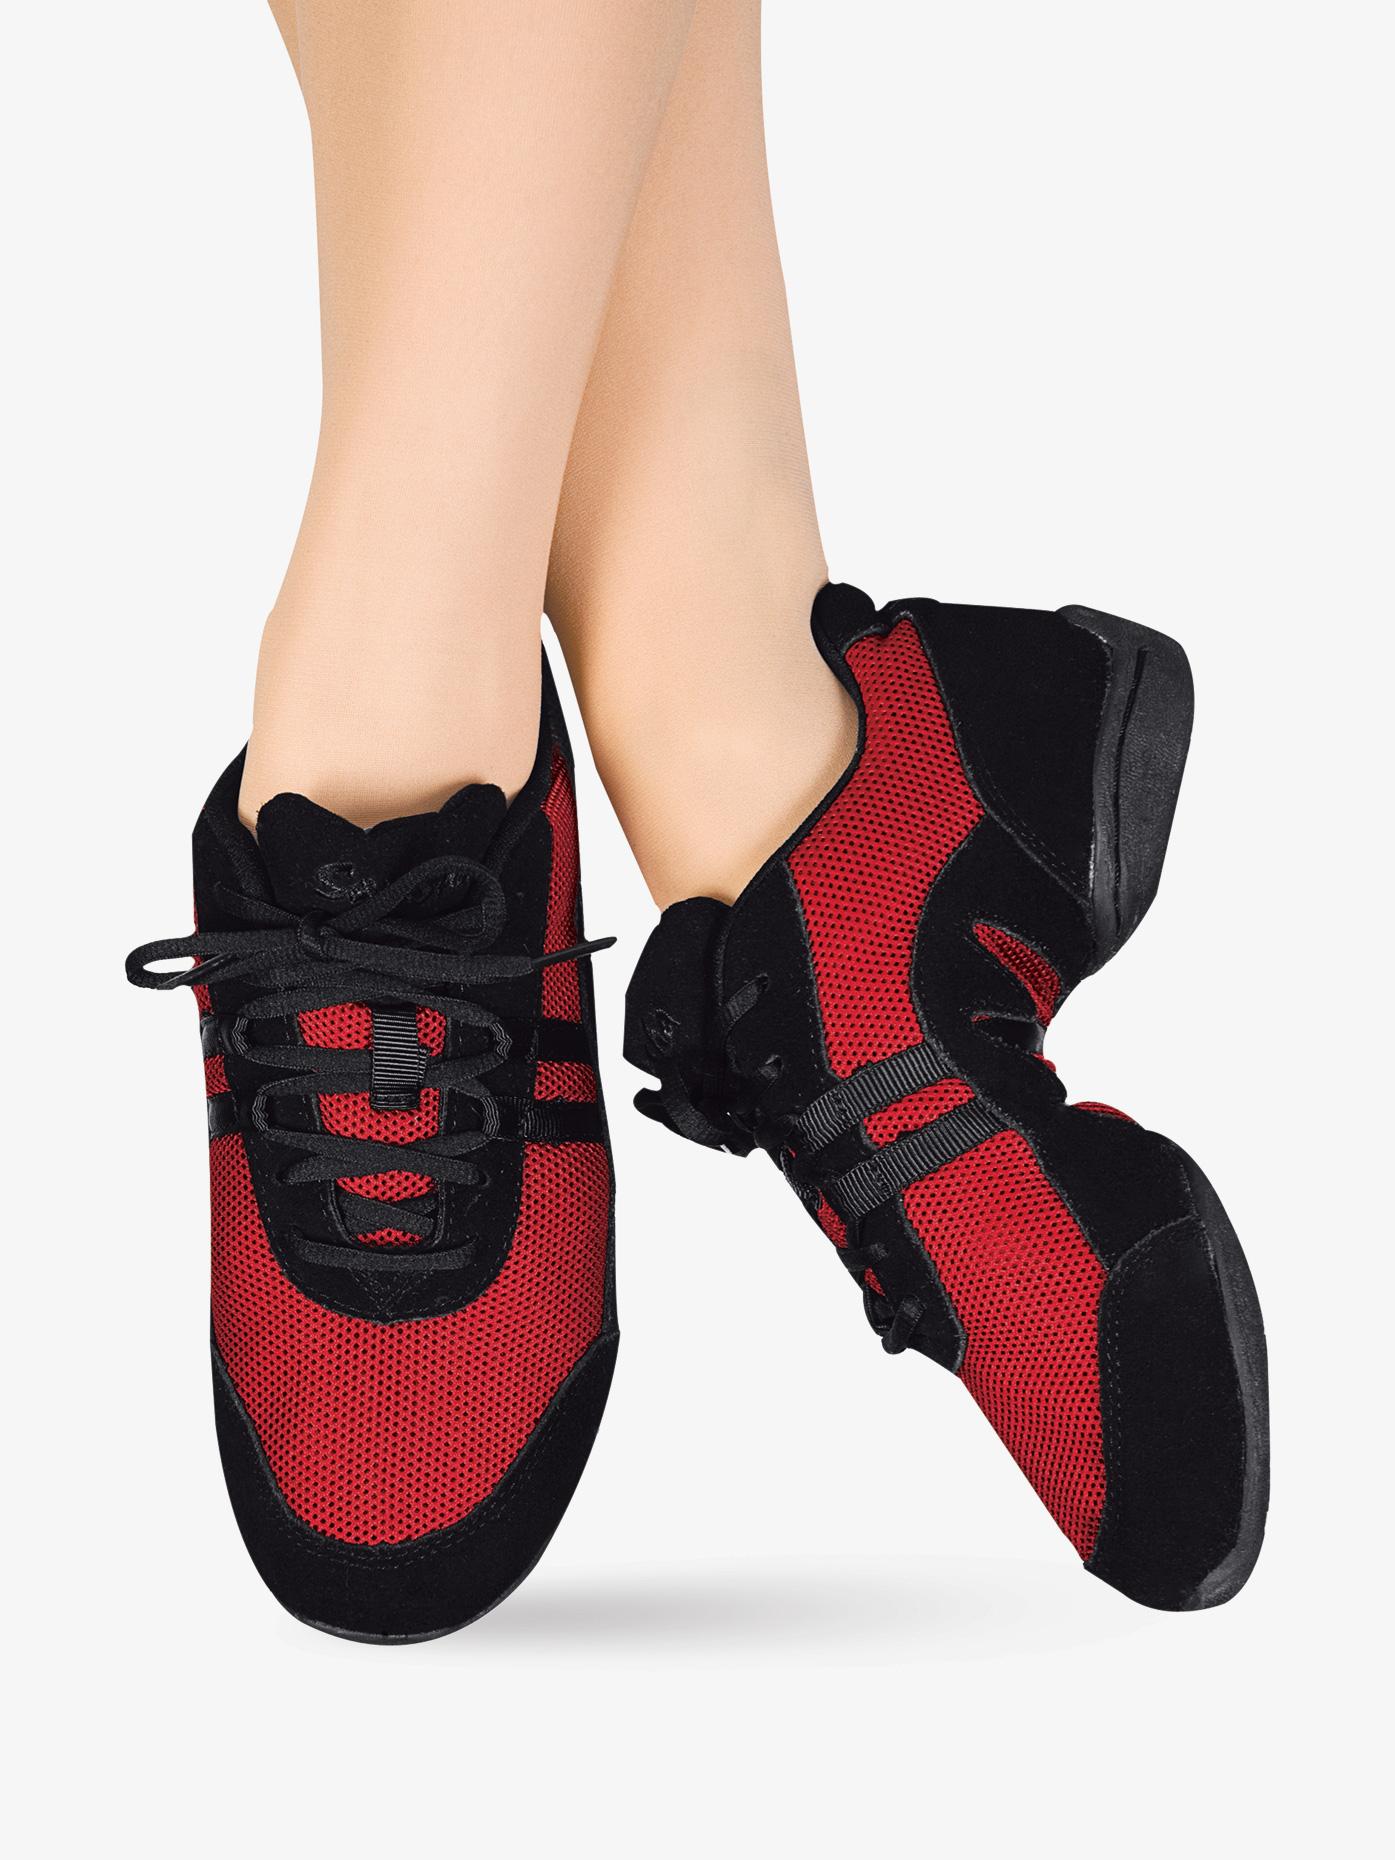 Sansha Adult Blitz-3 Dance Sneaker S33M